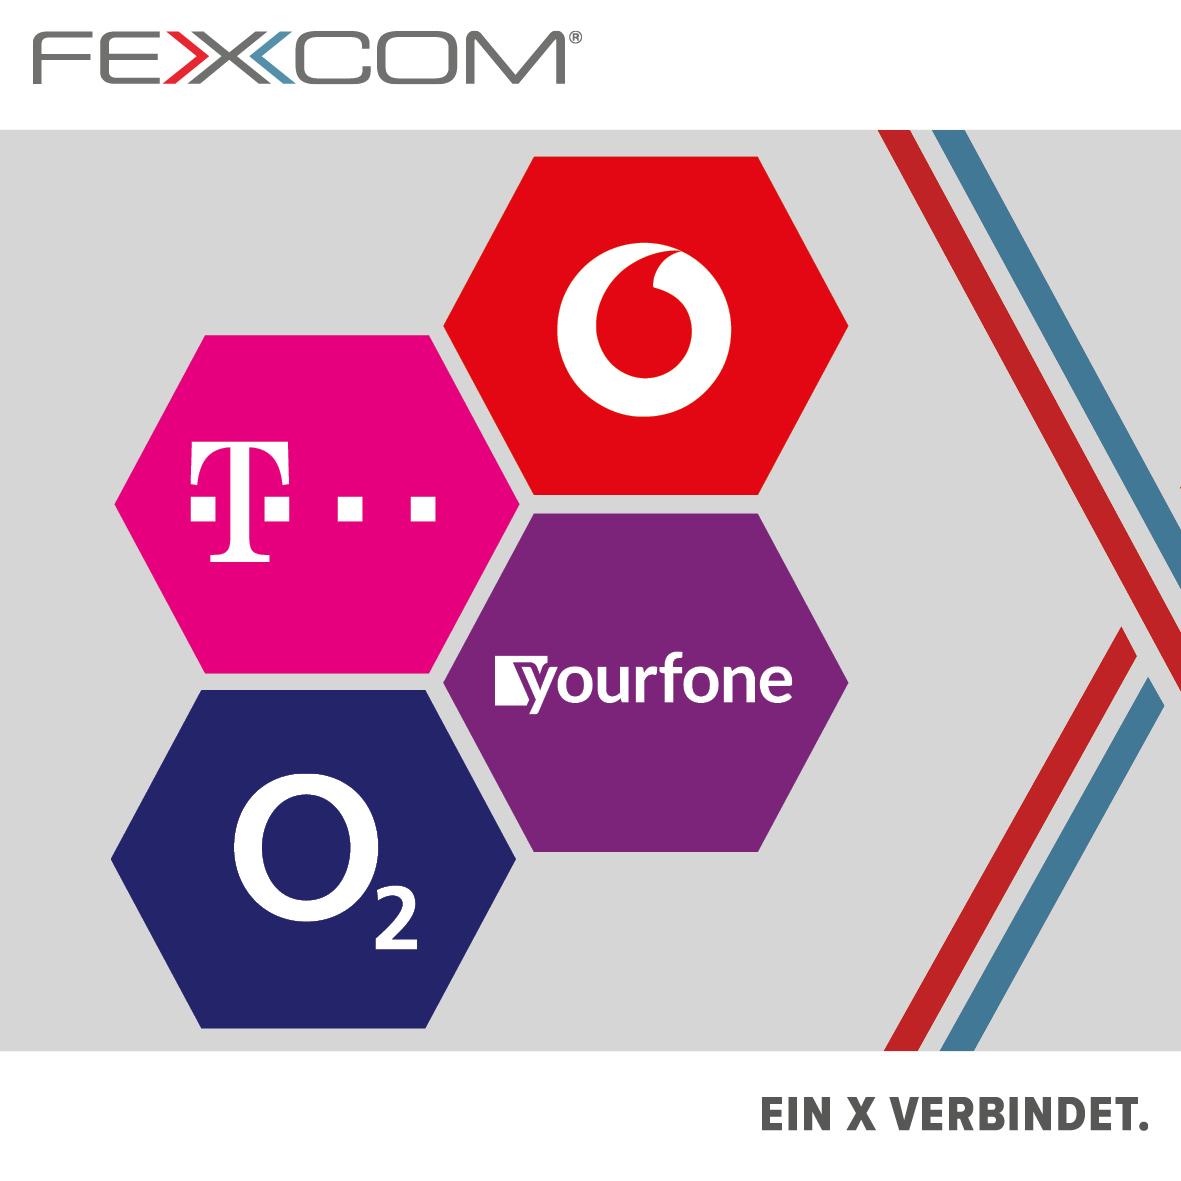 Mobilfunkshop FEXCOM QP Wachau